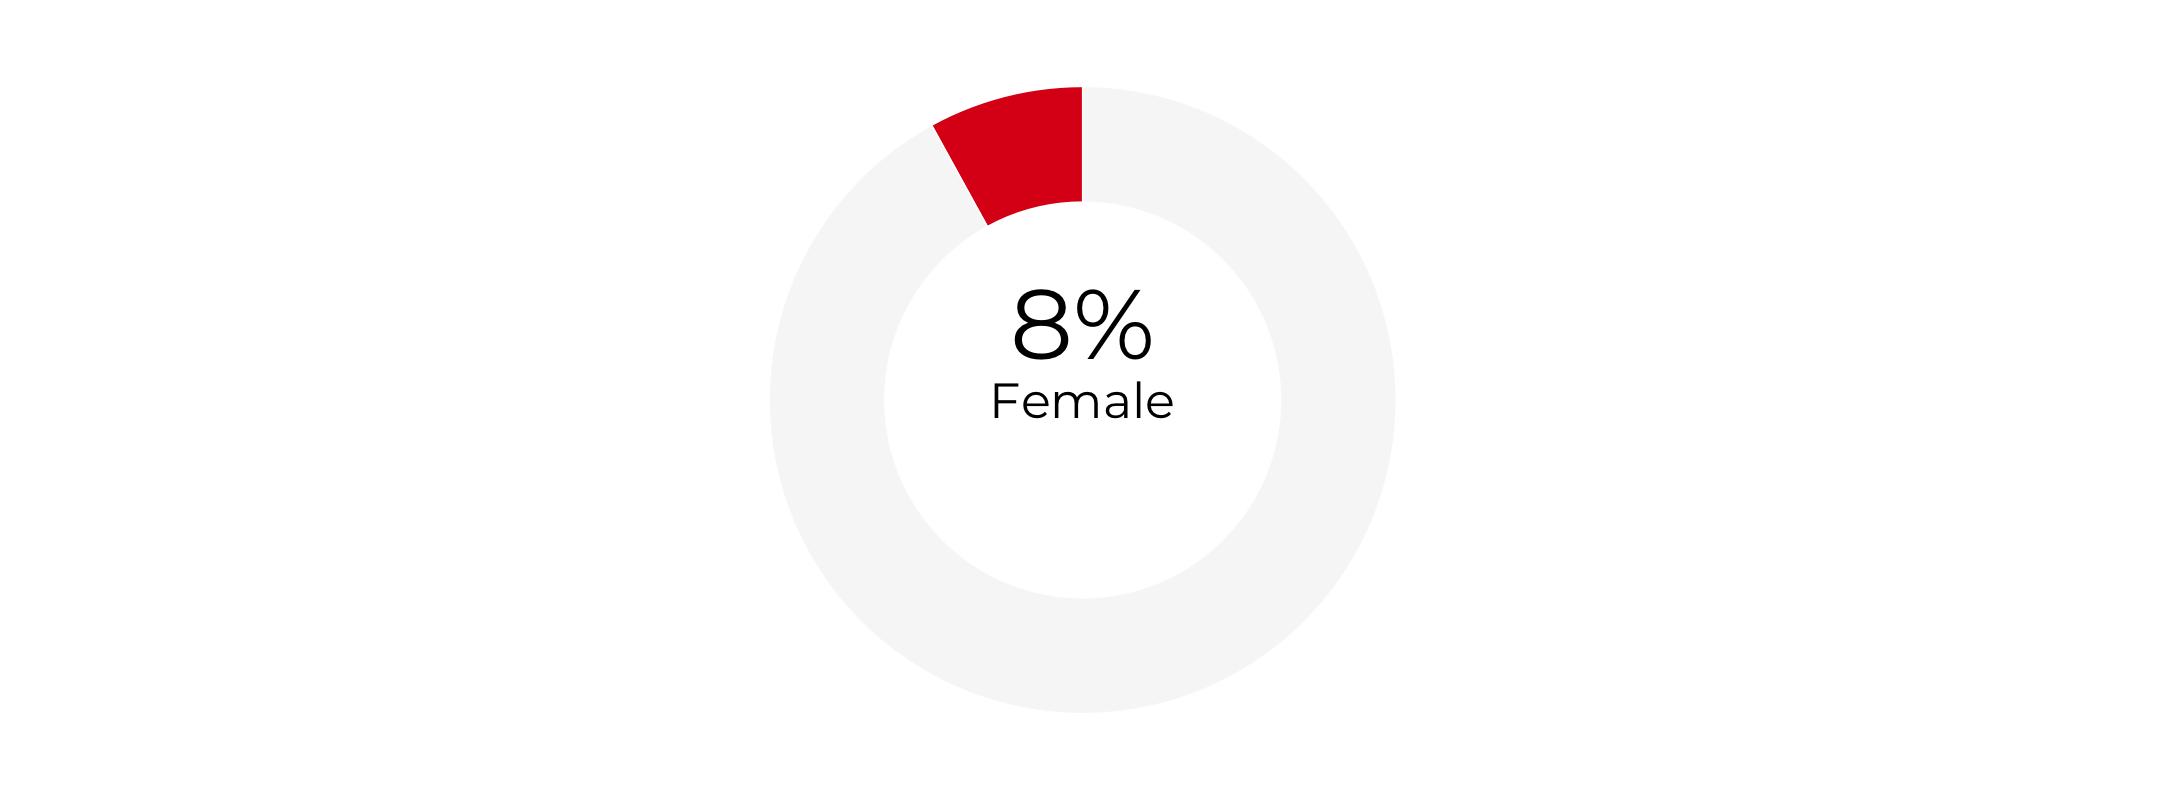 Graph about Gender Composition of Secretaries of Commerce. More detailed text description below.